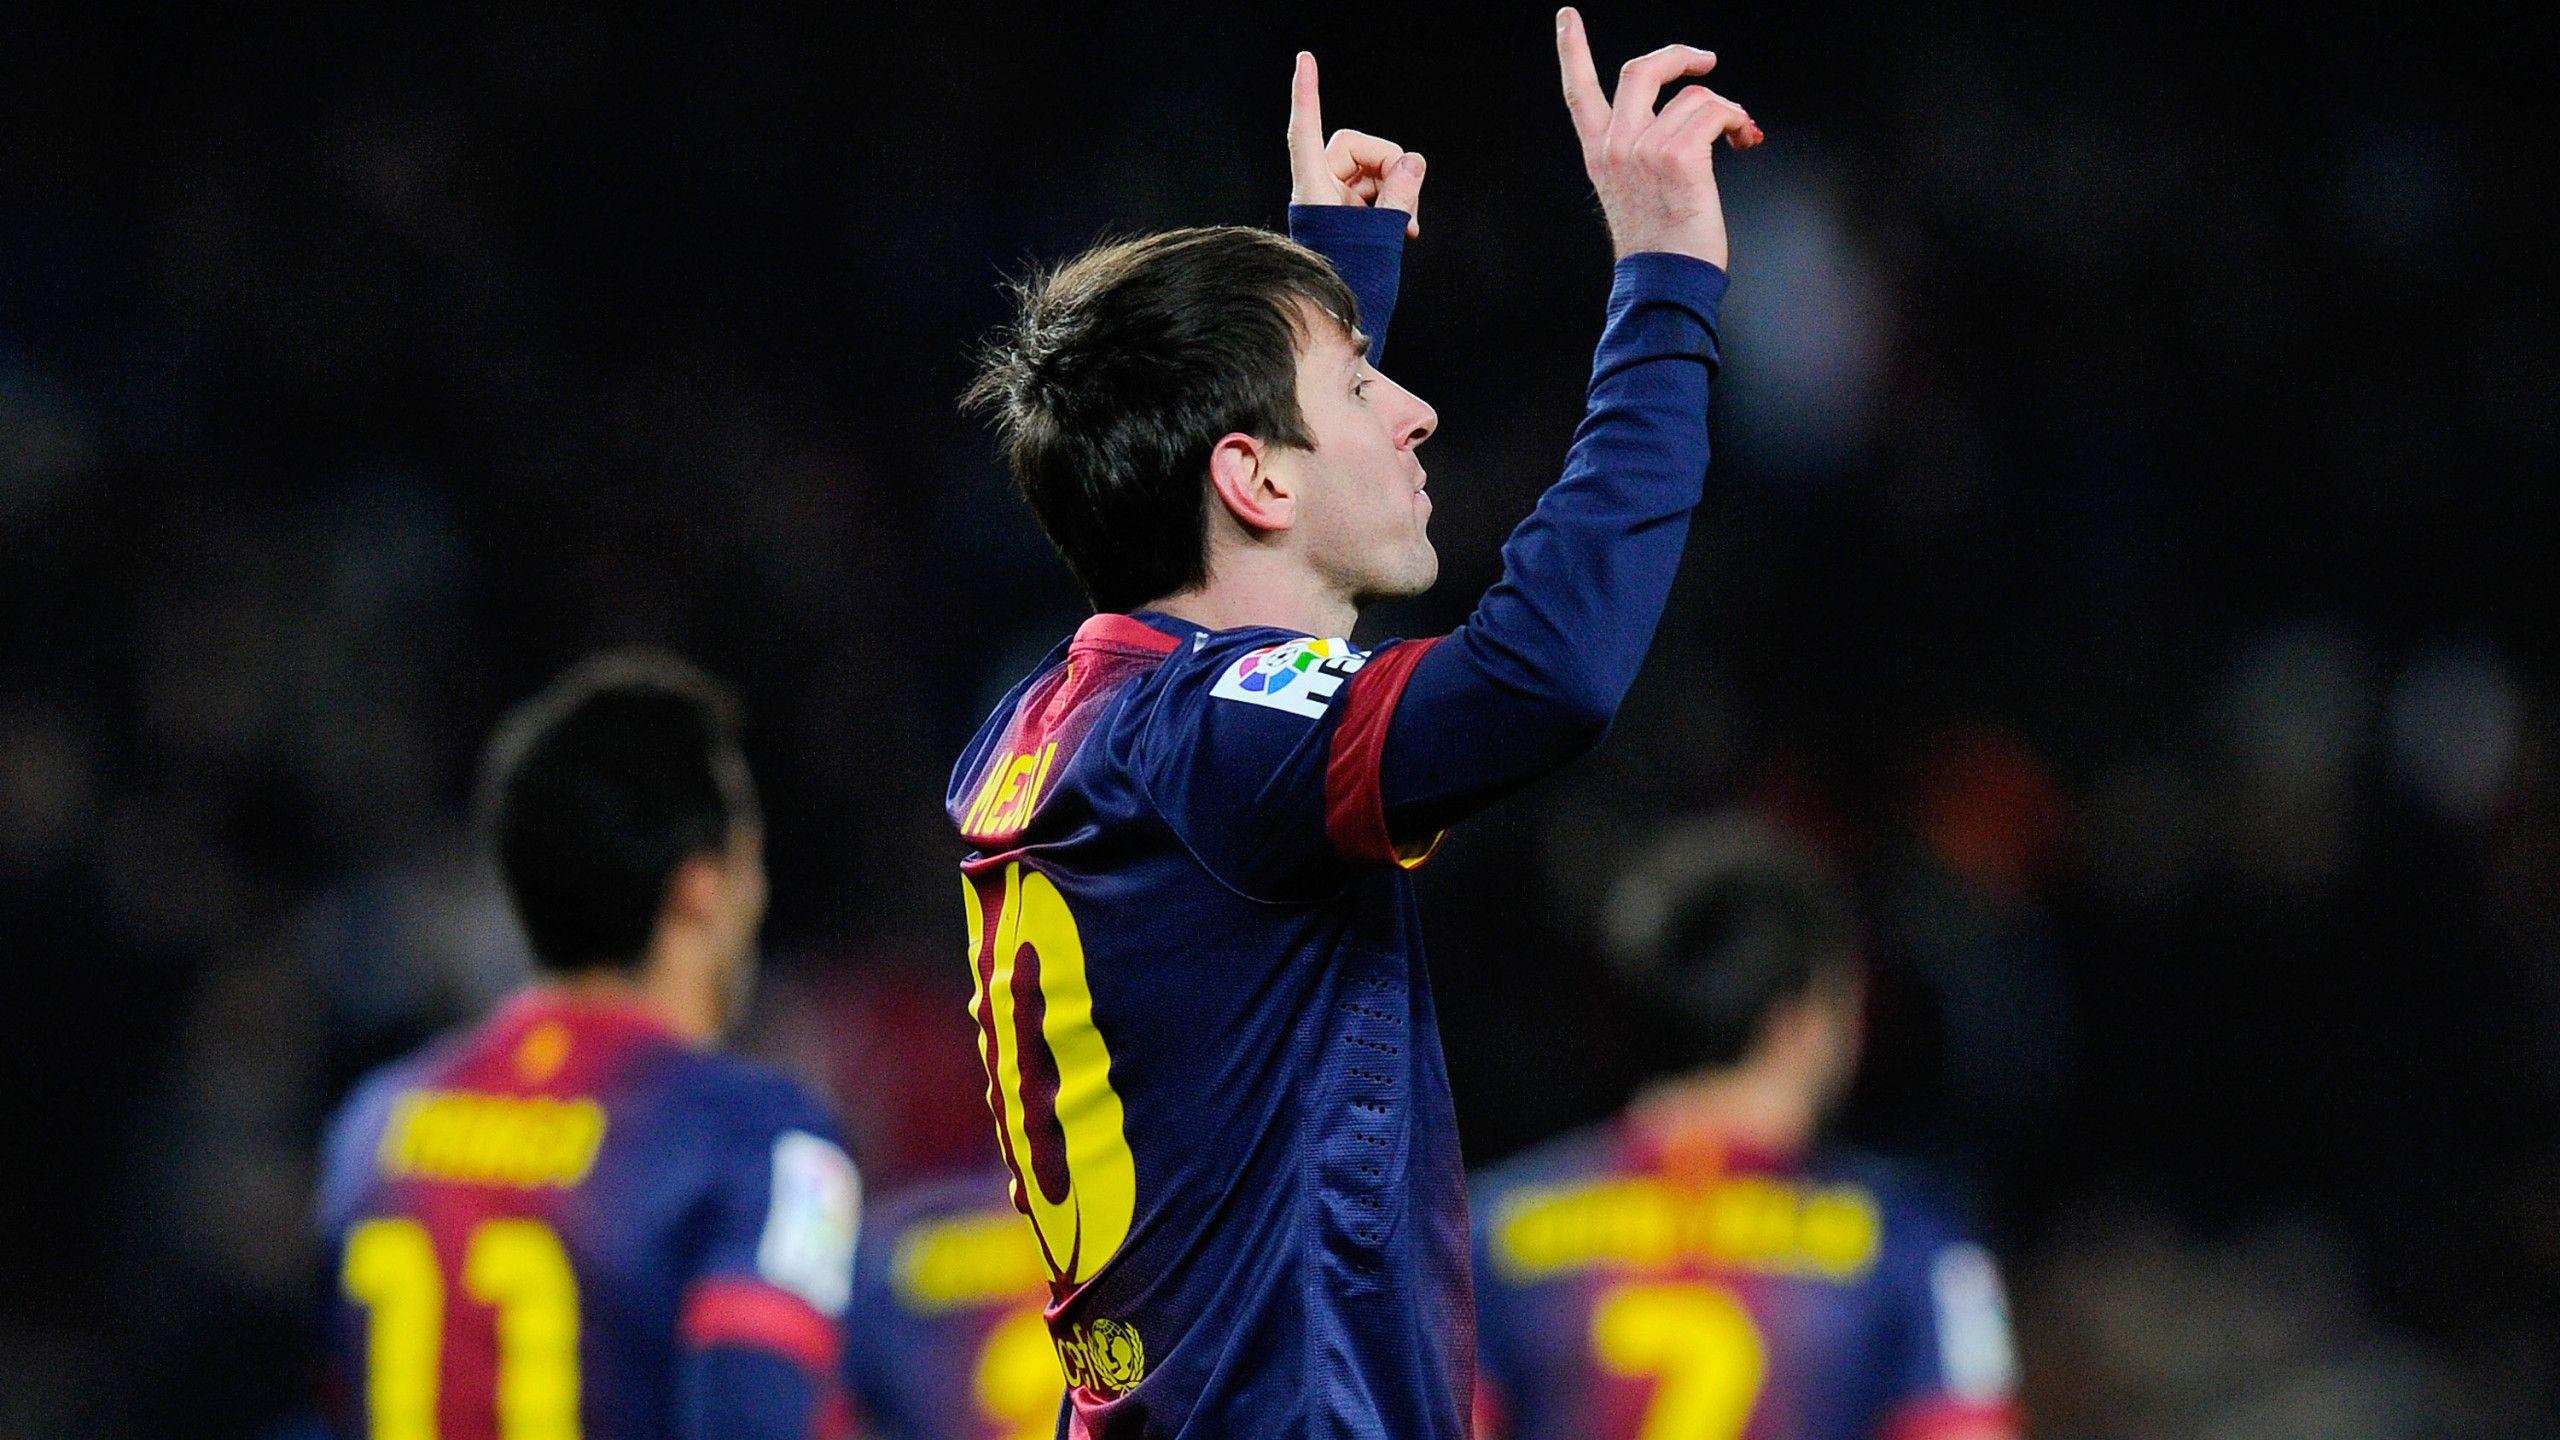 Download Wallpaper Lionel Messi Football Barcelona 1440 810 Lionel